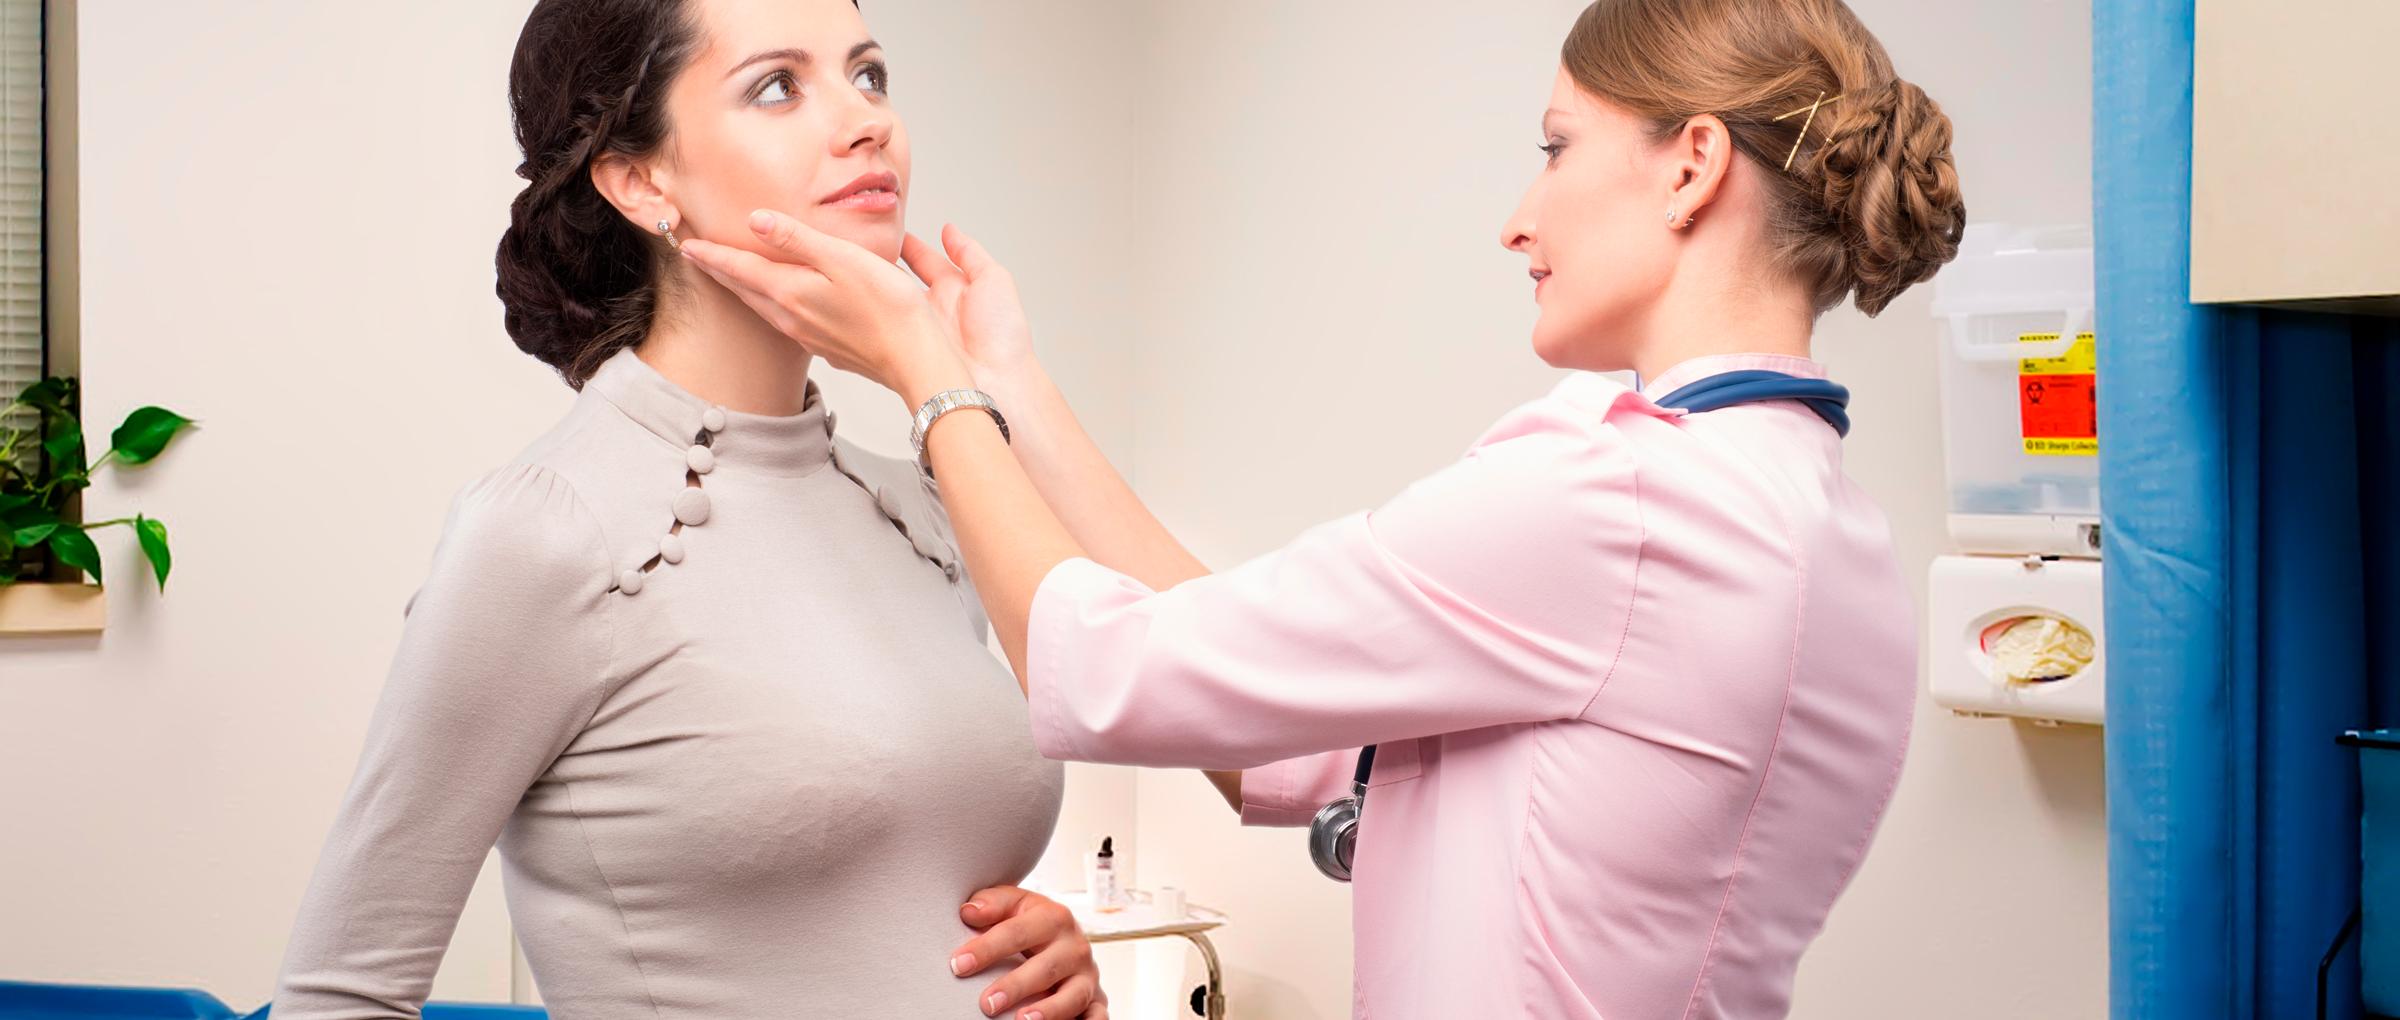 Control de la glándula tiroides en el embarazo